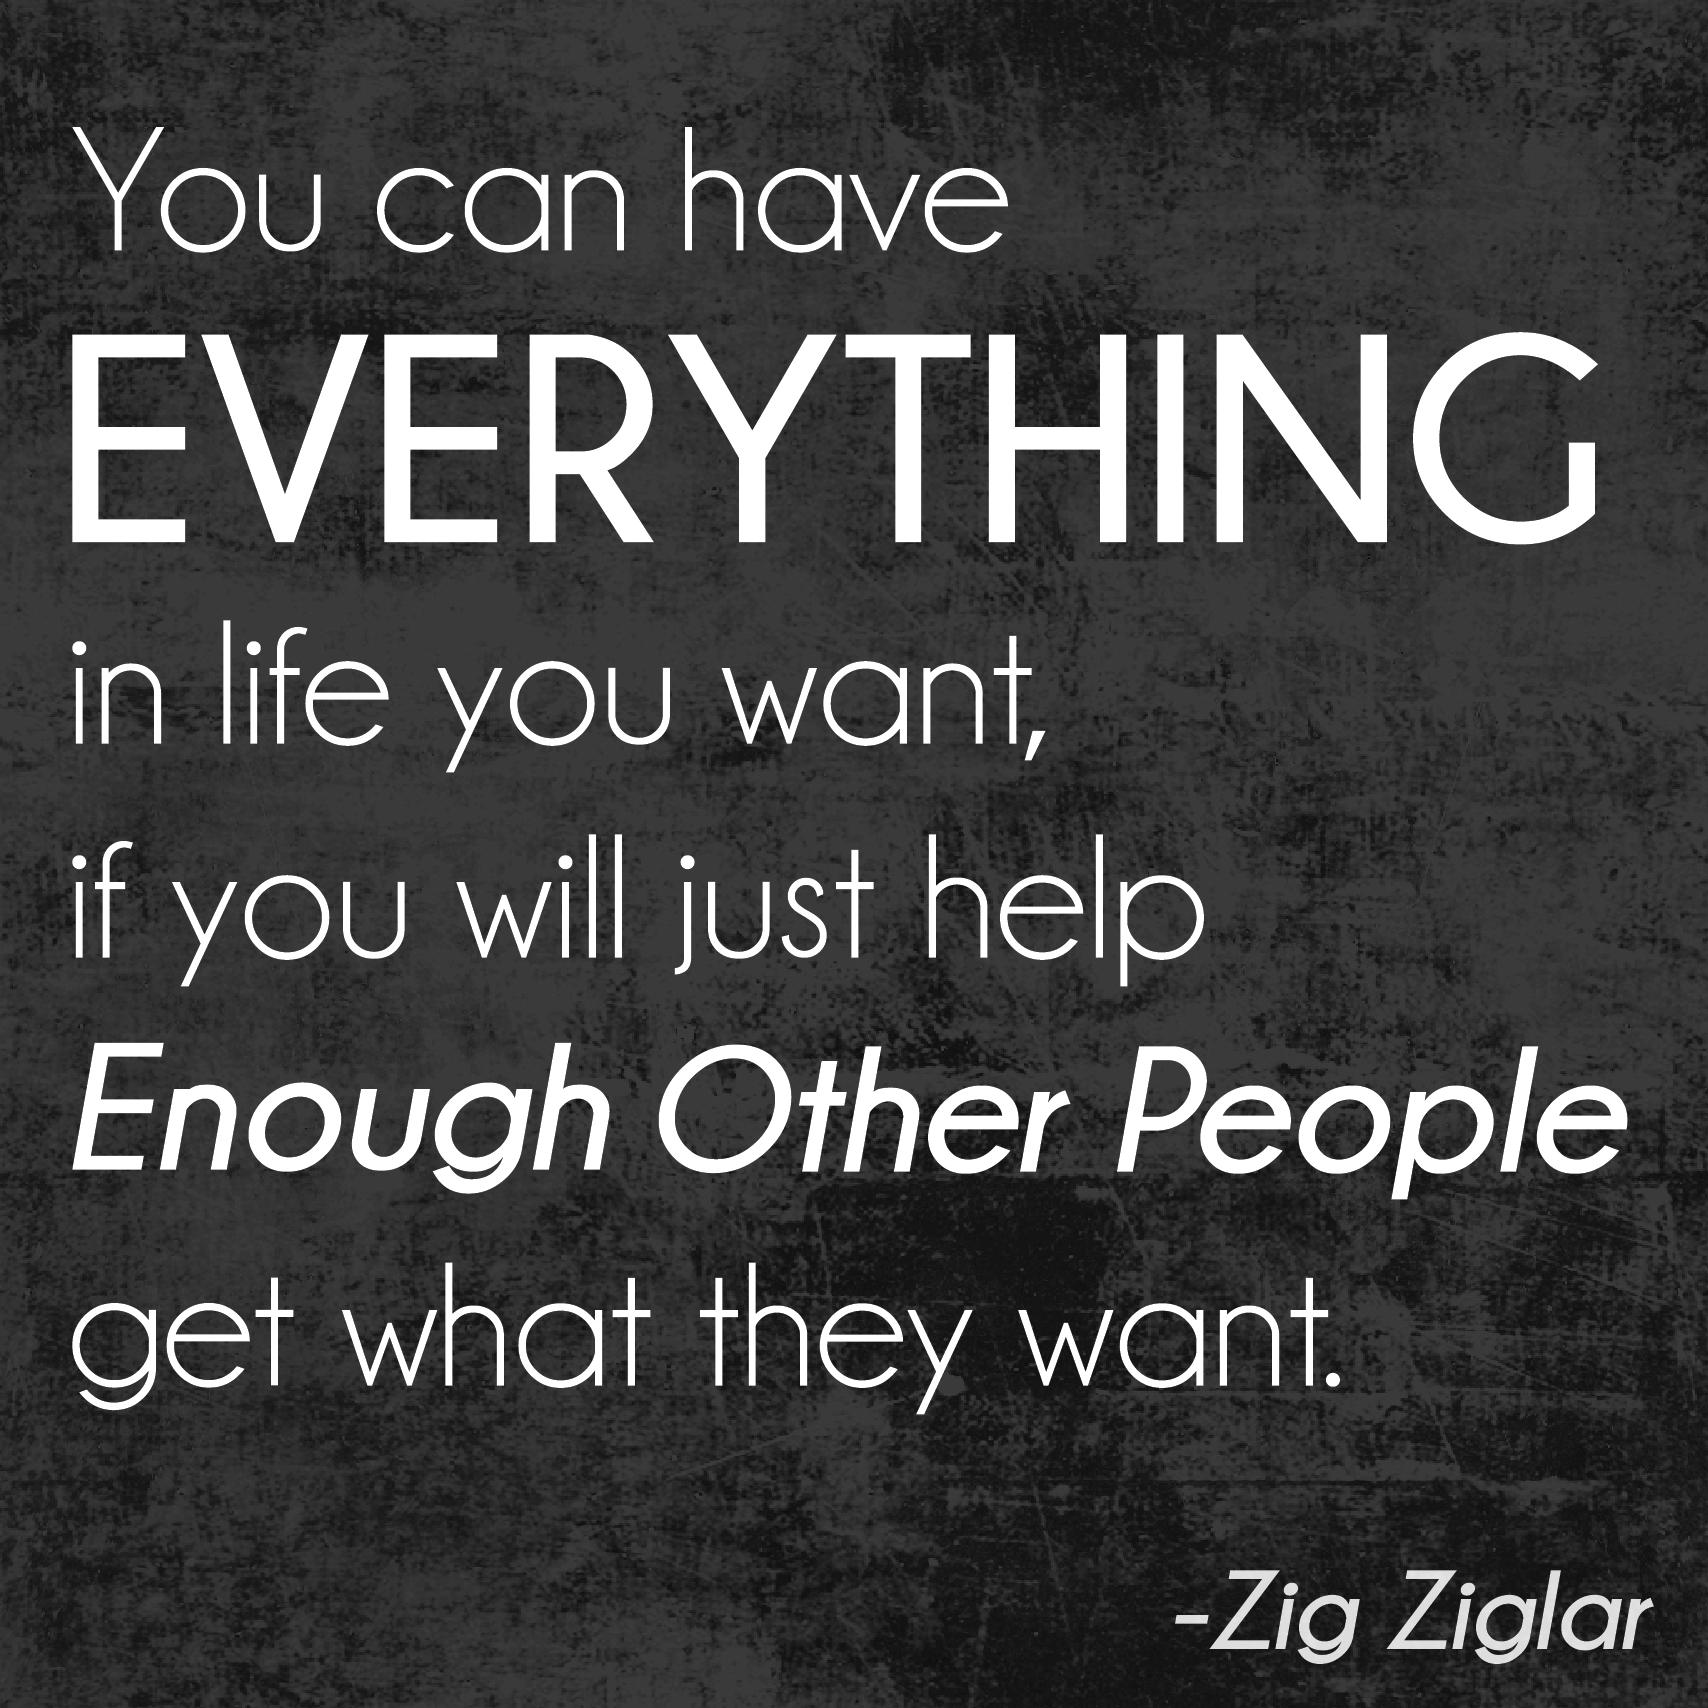 Zig Ziglar Quotes Helping Others. QuotesGram